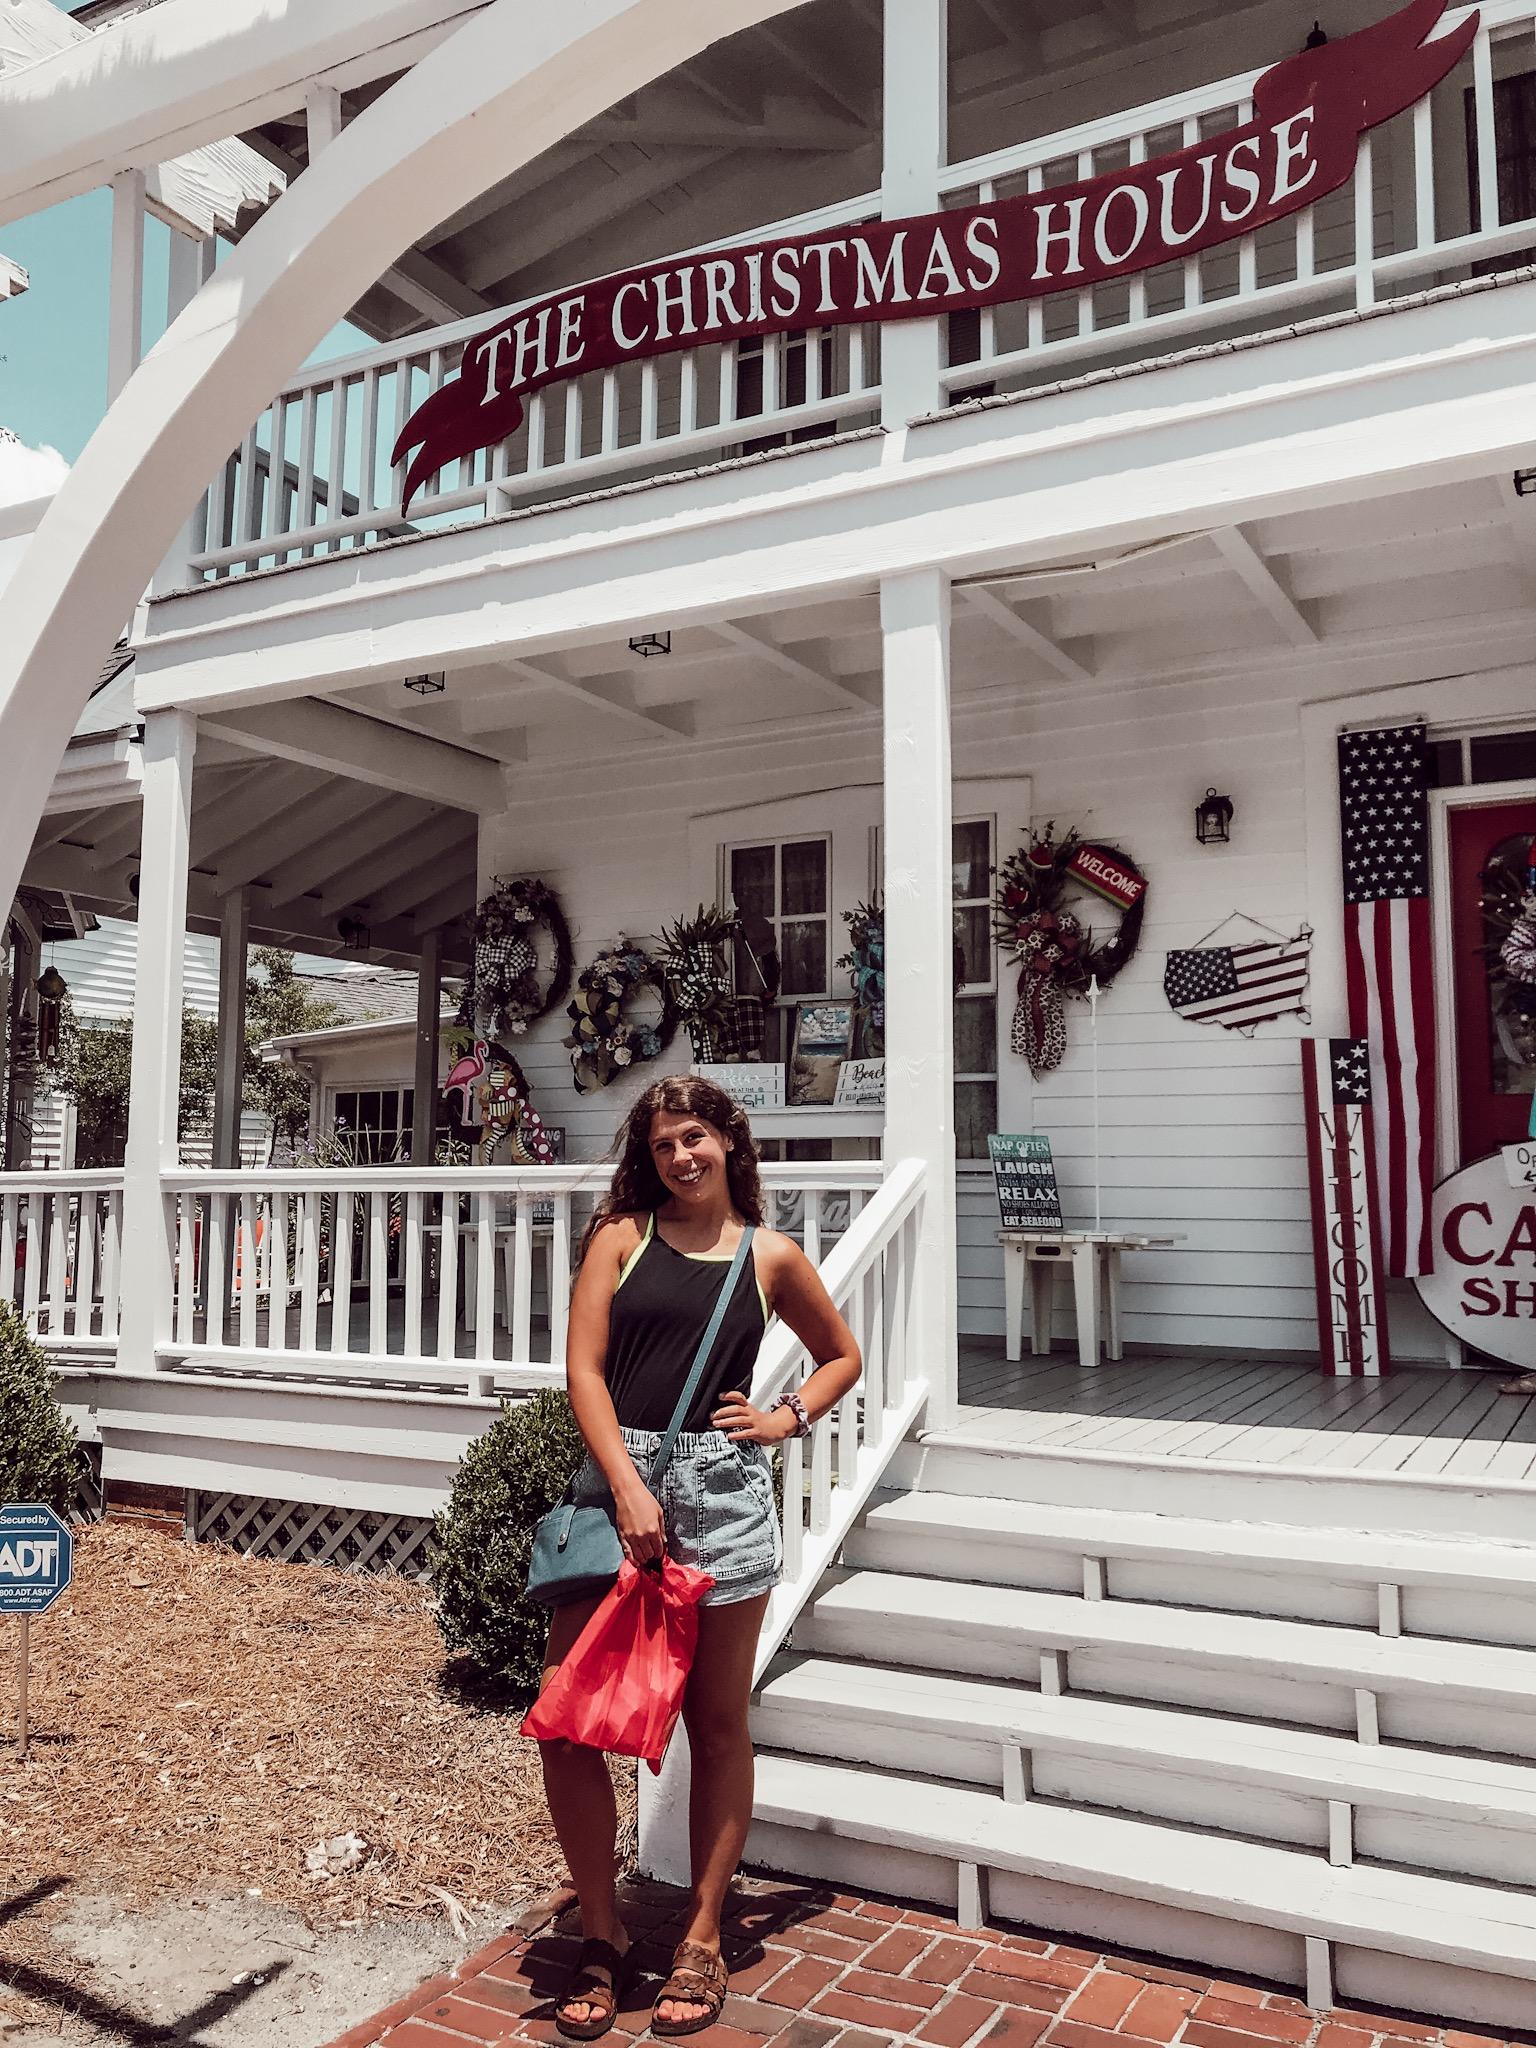 The Christmas House - Southport, NC